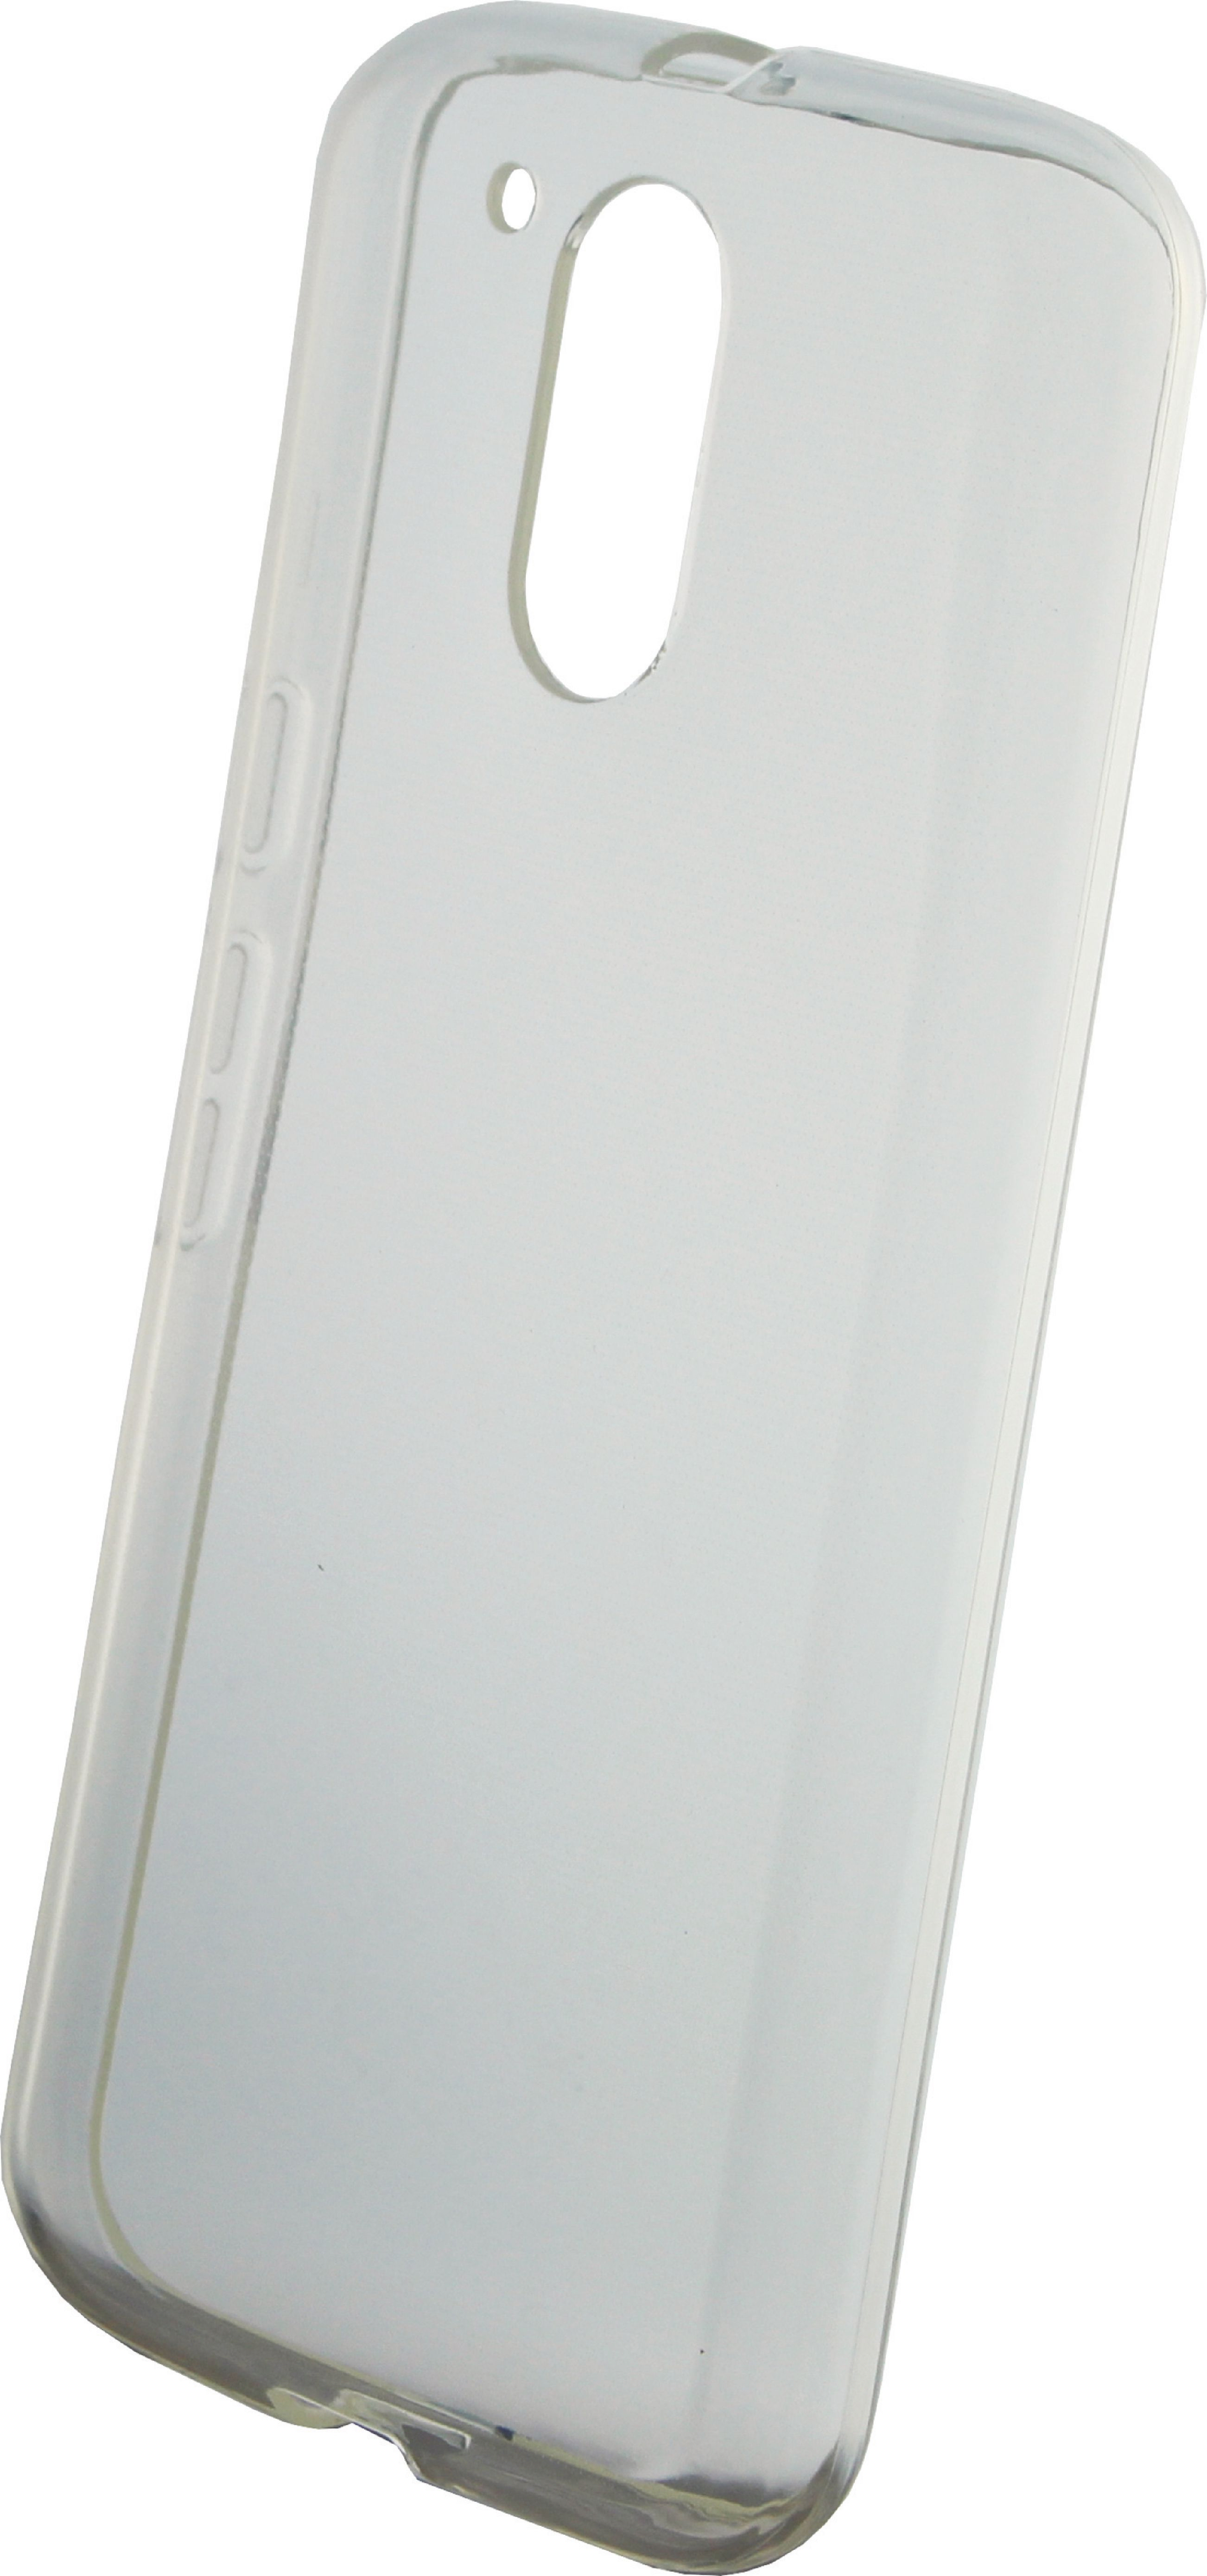 Image of   Telefon Gel-Etui Motorola Moto G4 / G4 Plus Gennemsigtig